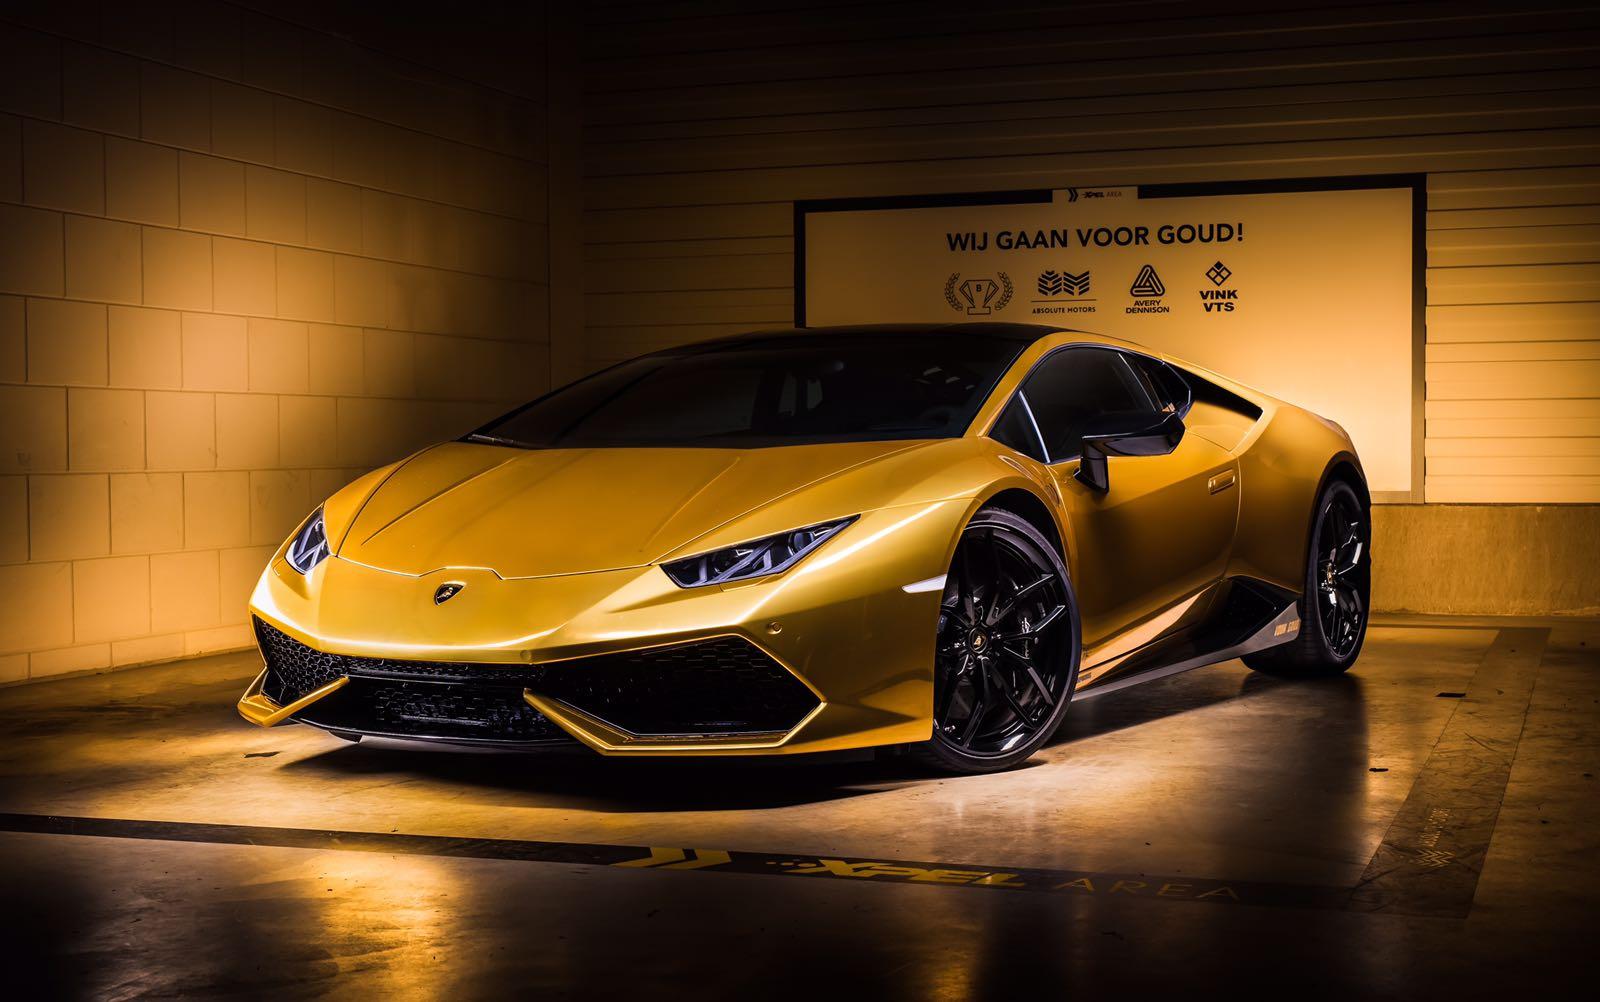 Joel Beukers Laat Z'n Lamborghini Hurácan Goud Wrappen Fhm